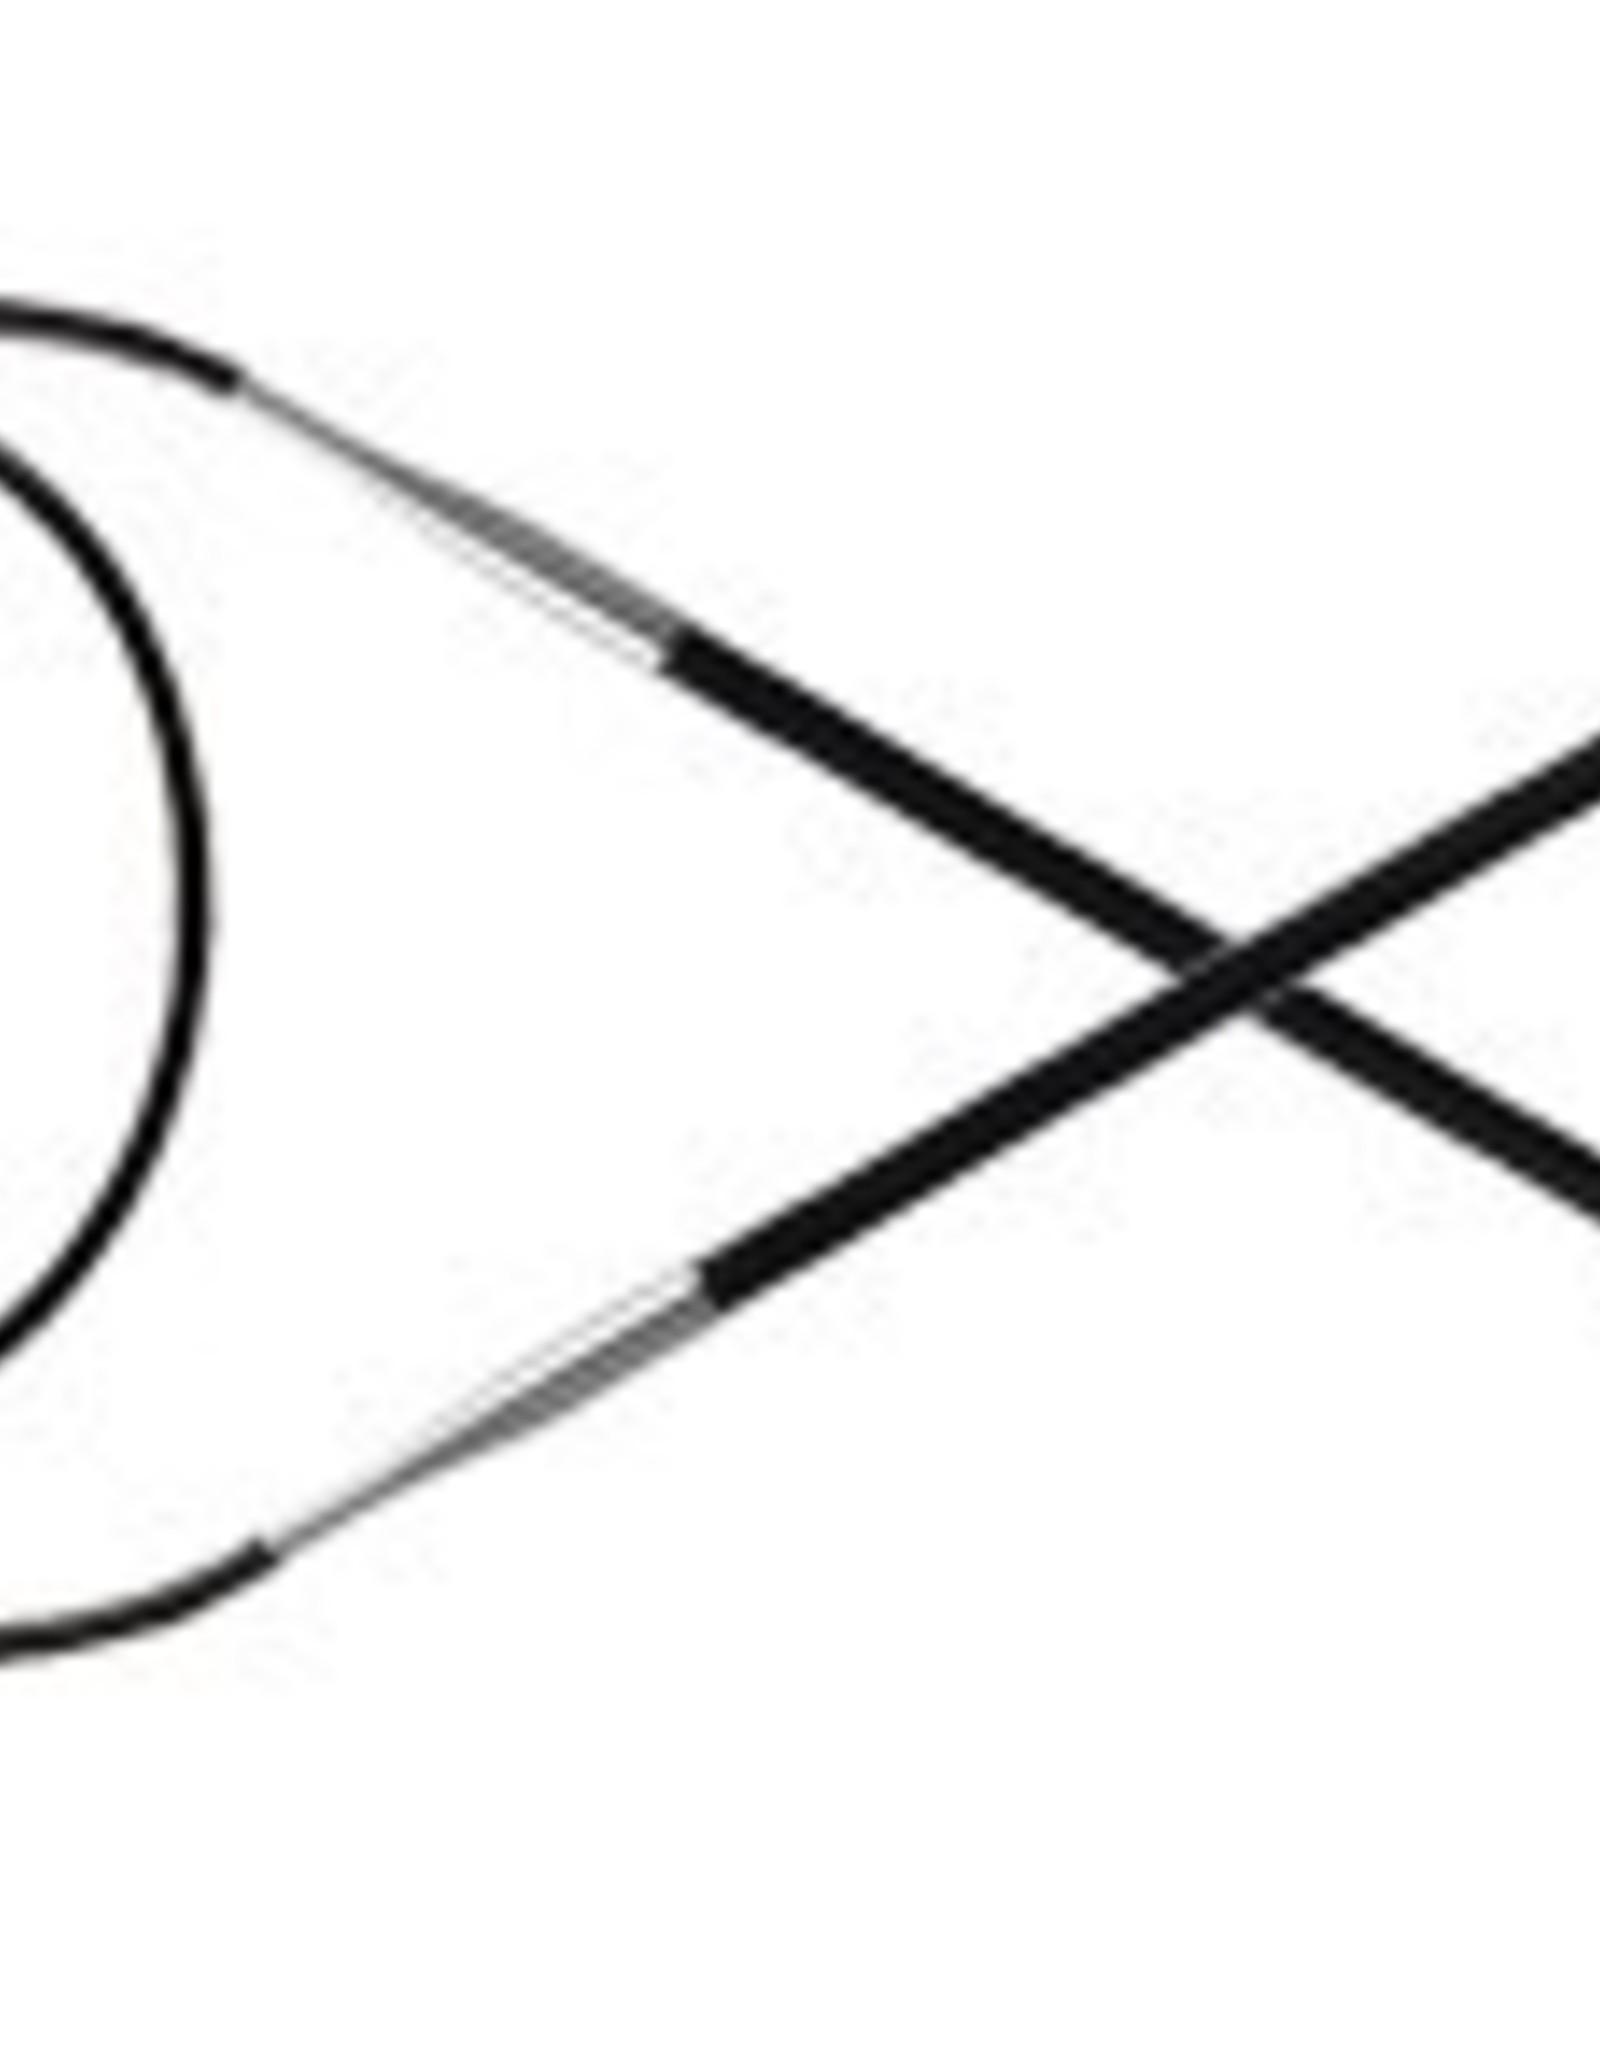 Knitter's Pride 8 Karbonz Circular 32